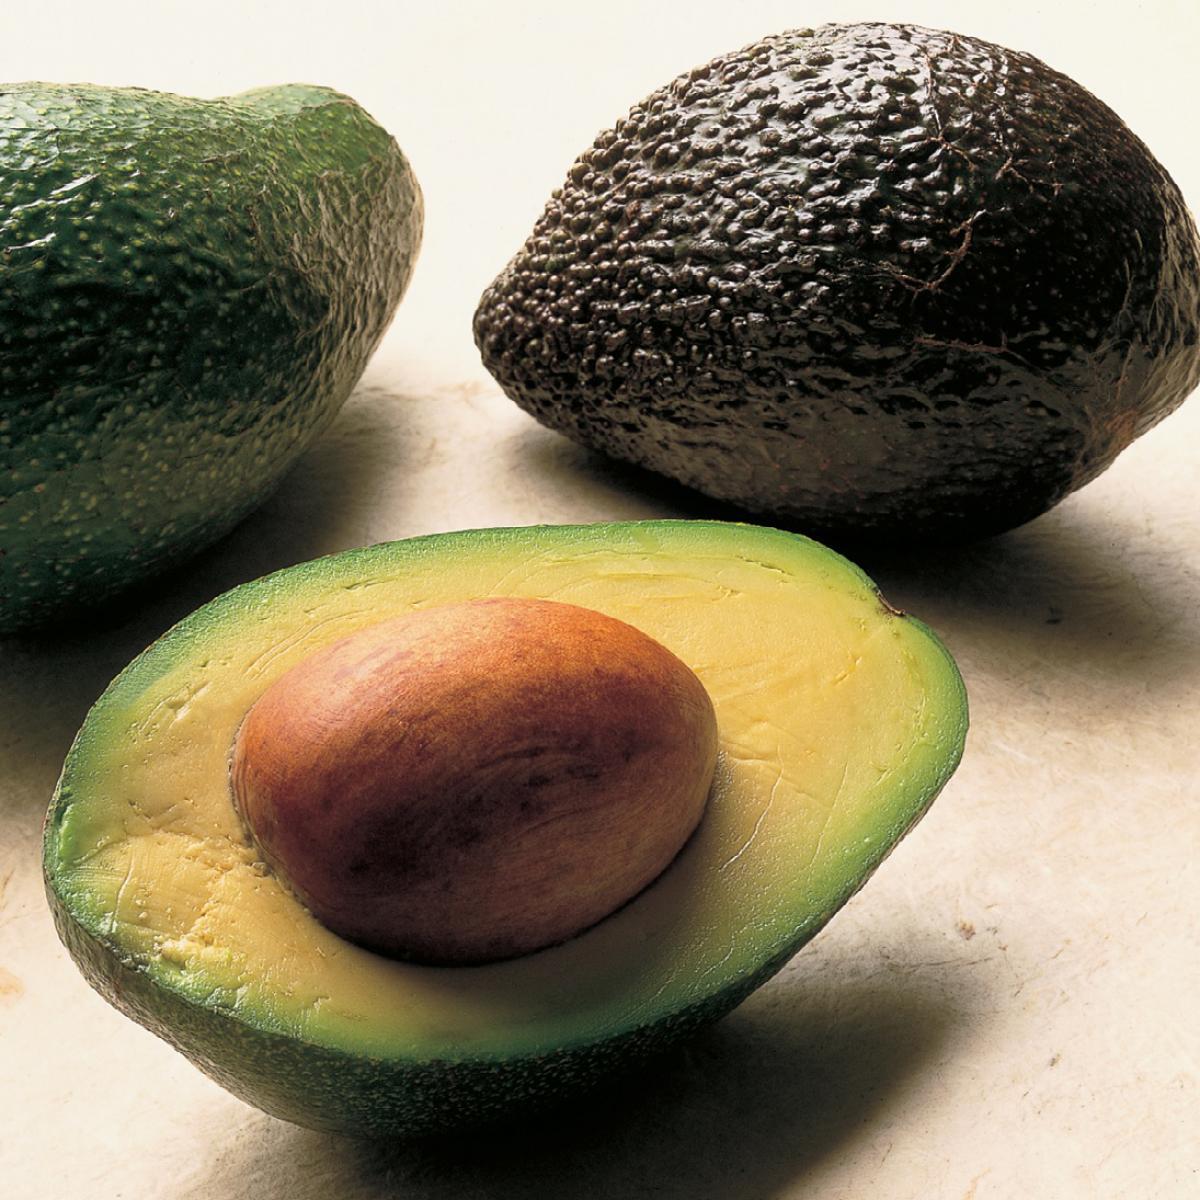 Ingredient vegetarian avocado